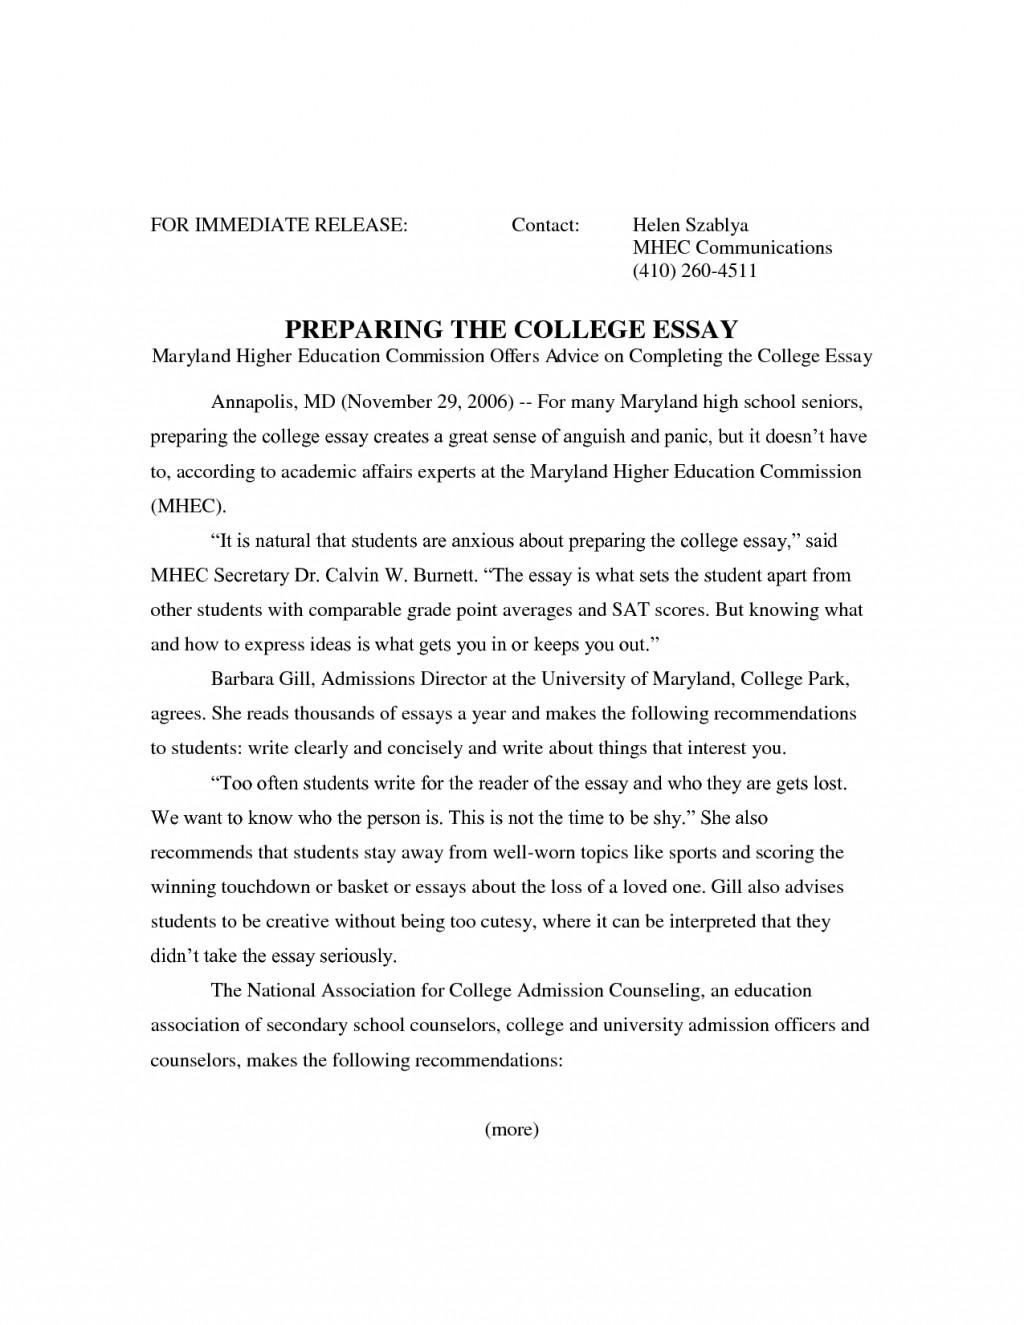 006 Ba7kkdwq2n Essay Example College Archaicawful Header Application Margins Large